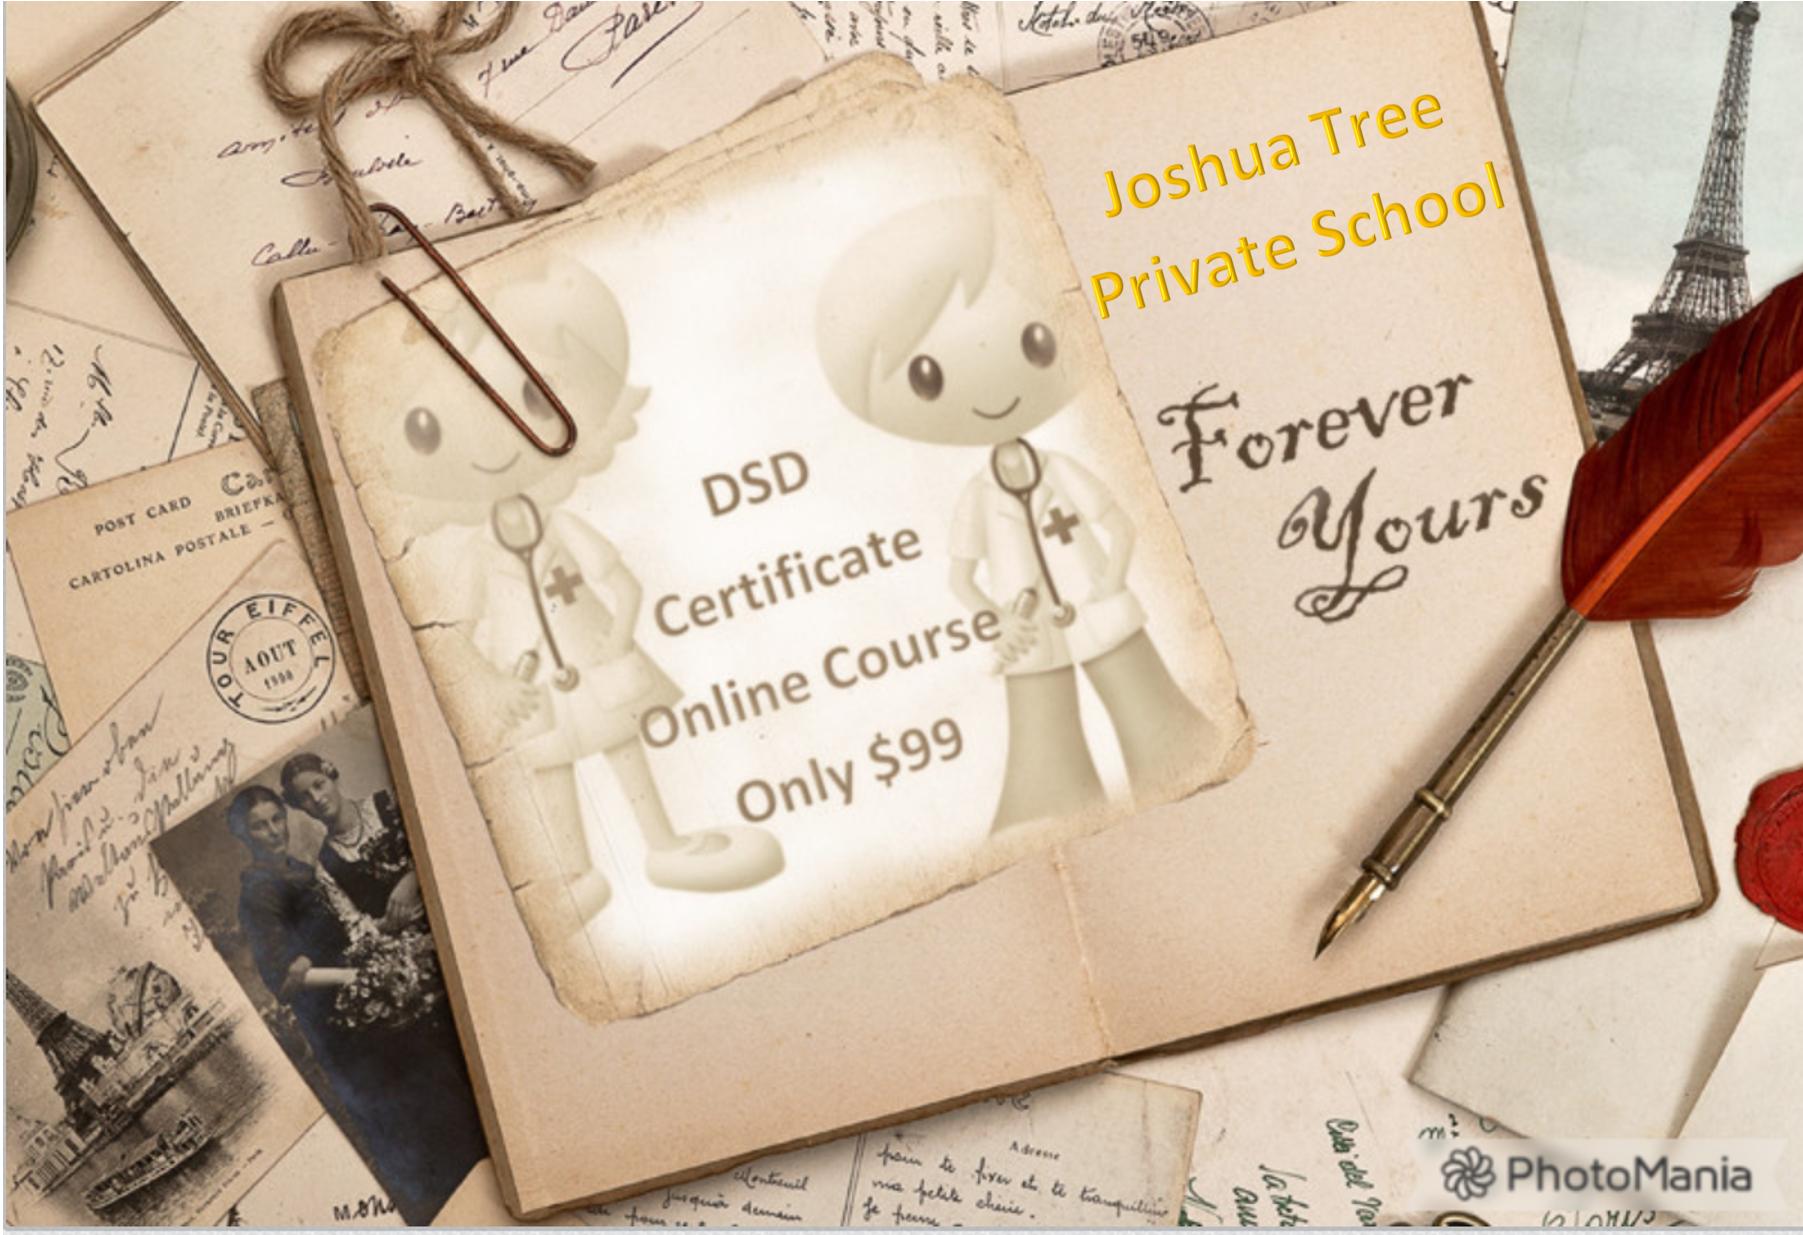 DSD Director of staff development certification California